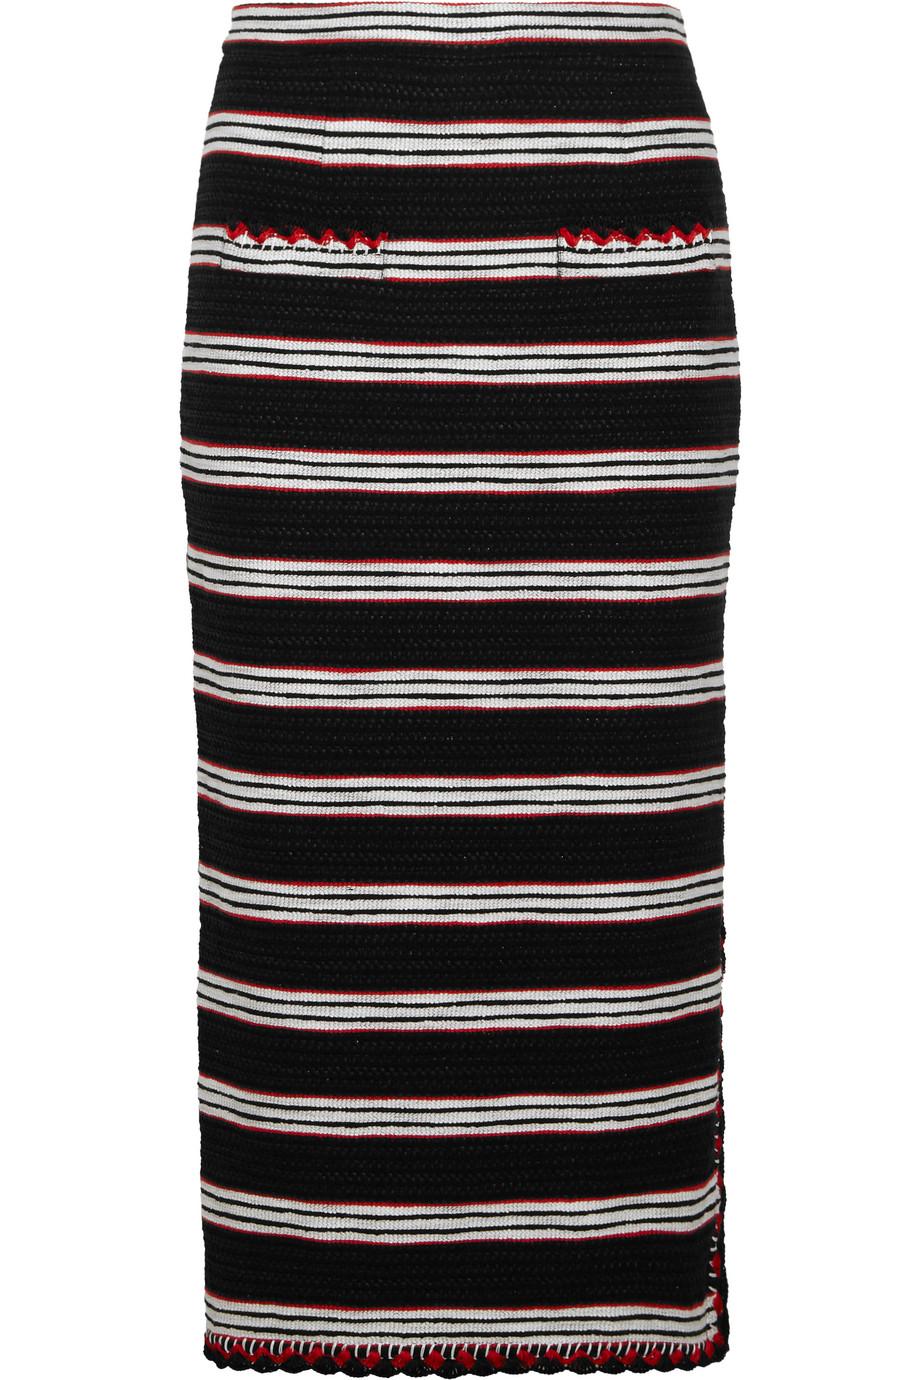 Striped Stretch Cotton-Blend Tweed Skirt, Black, Women's, Size: 38